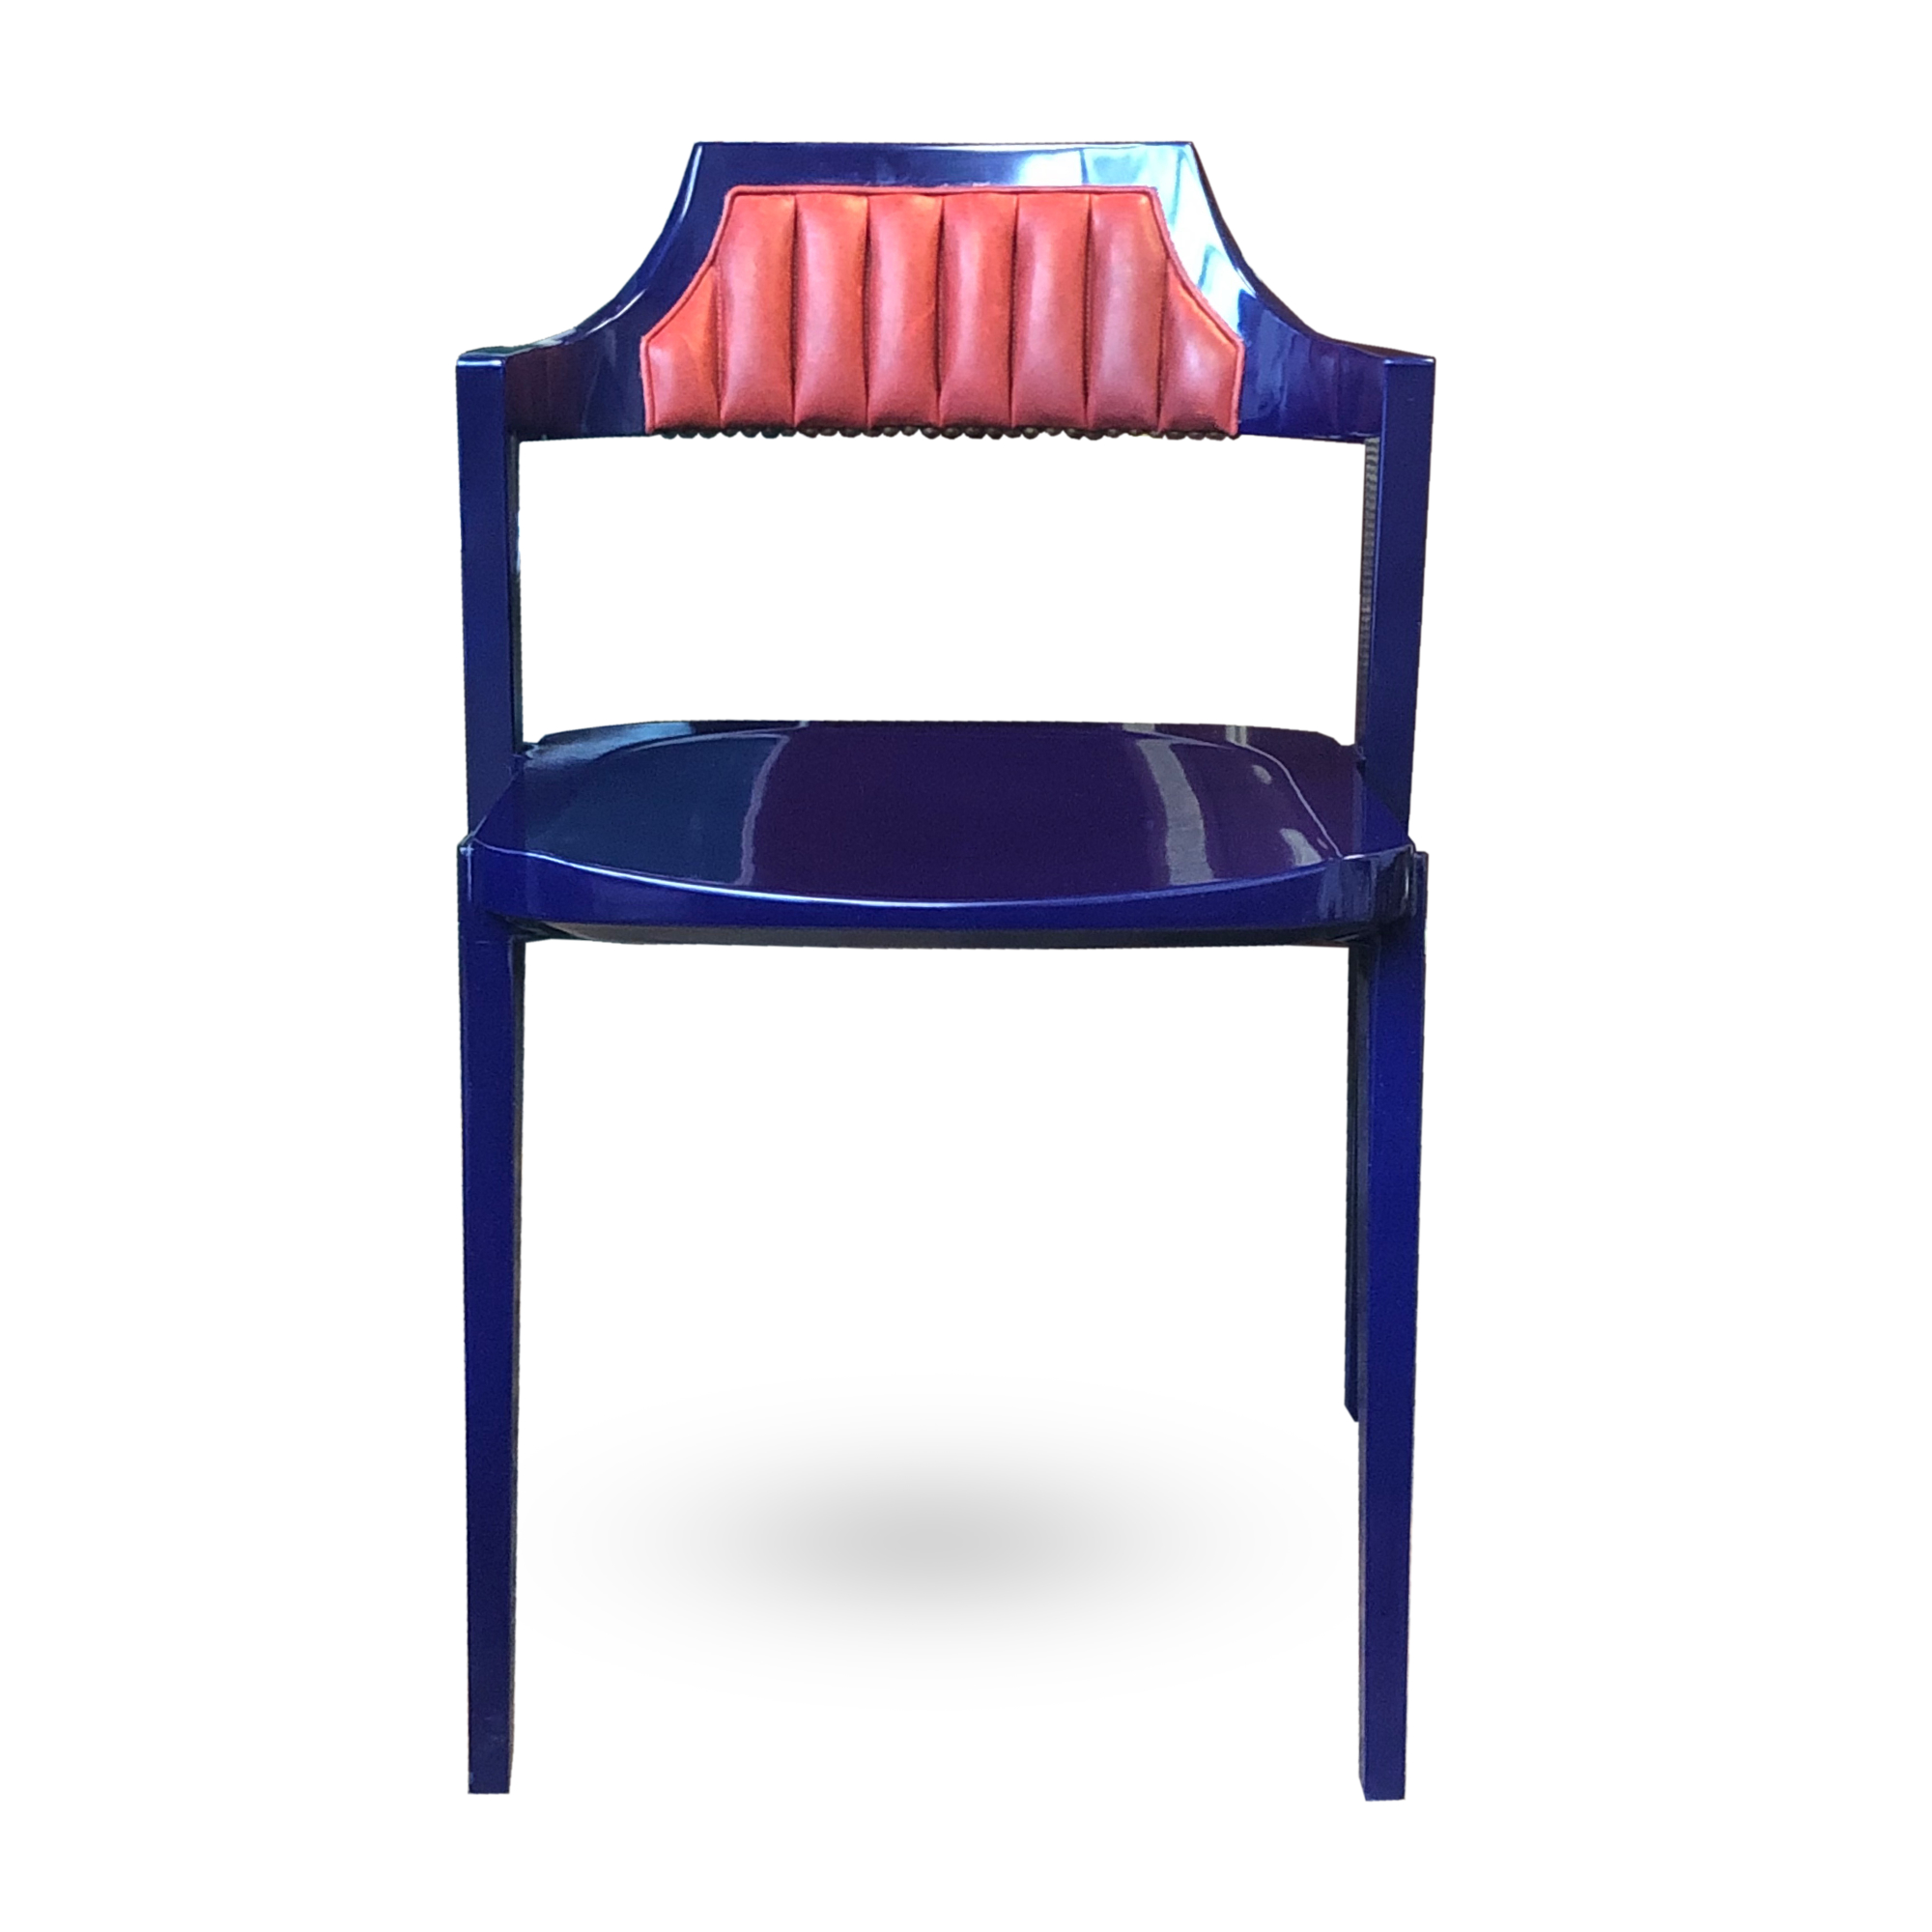 R813-ink-blue-stalking-chair-leather-upholstery-nailhead-trim-modern-design.jpg